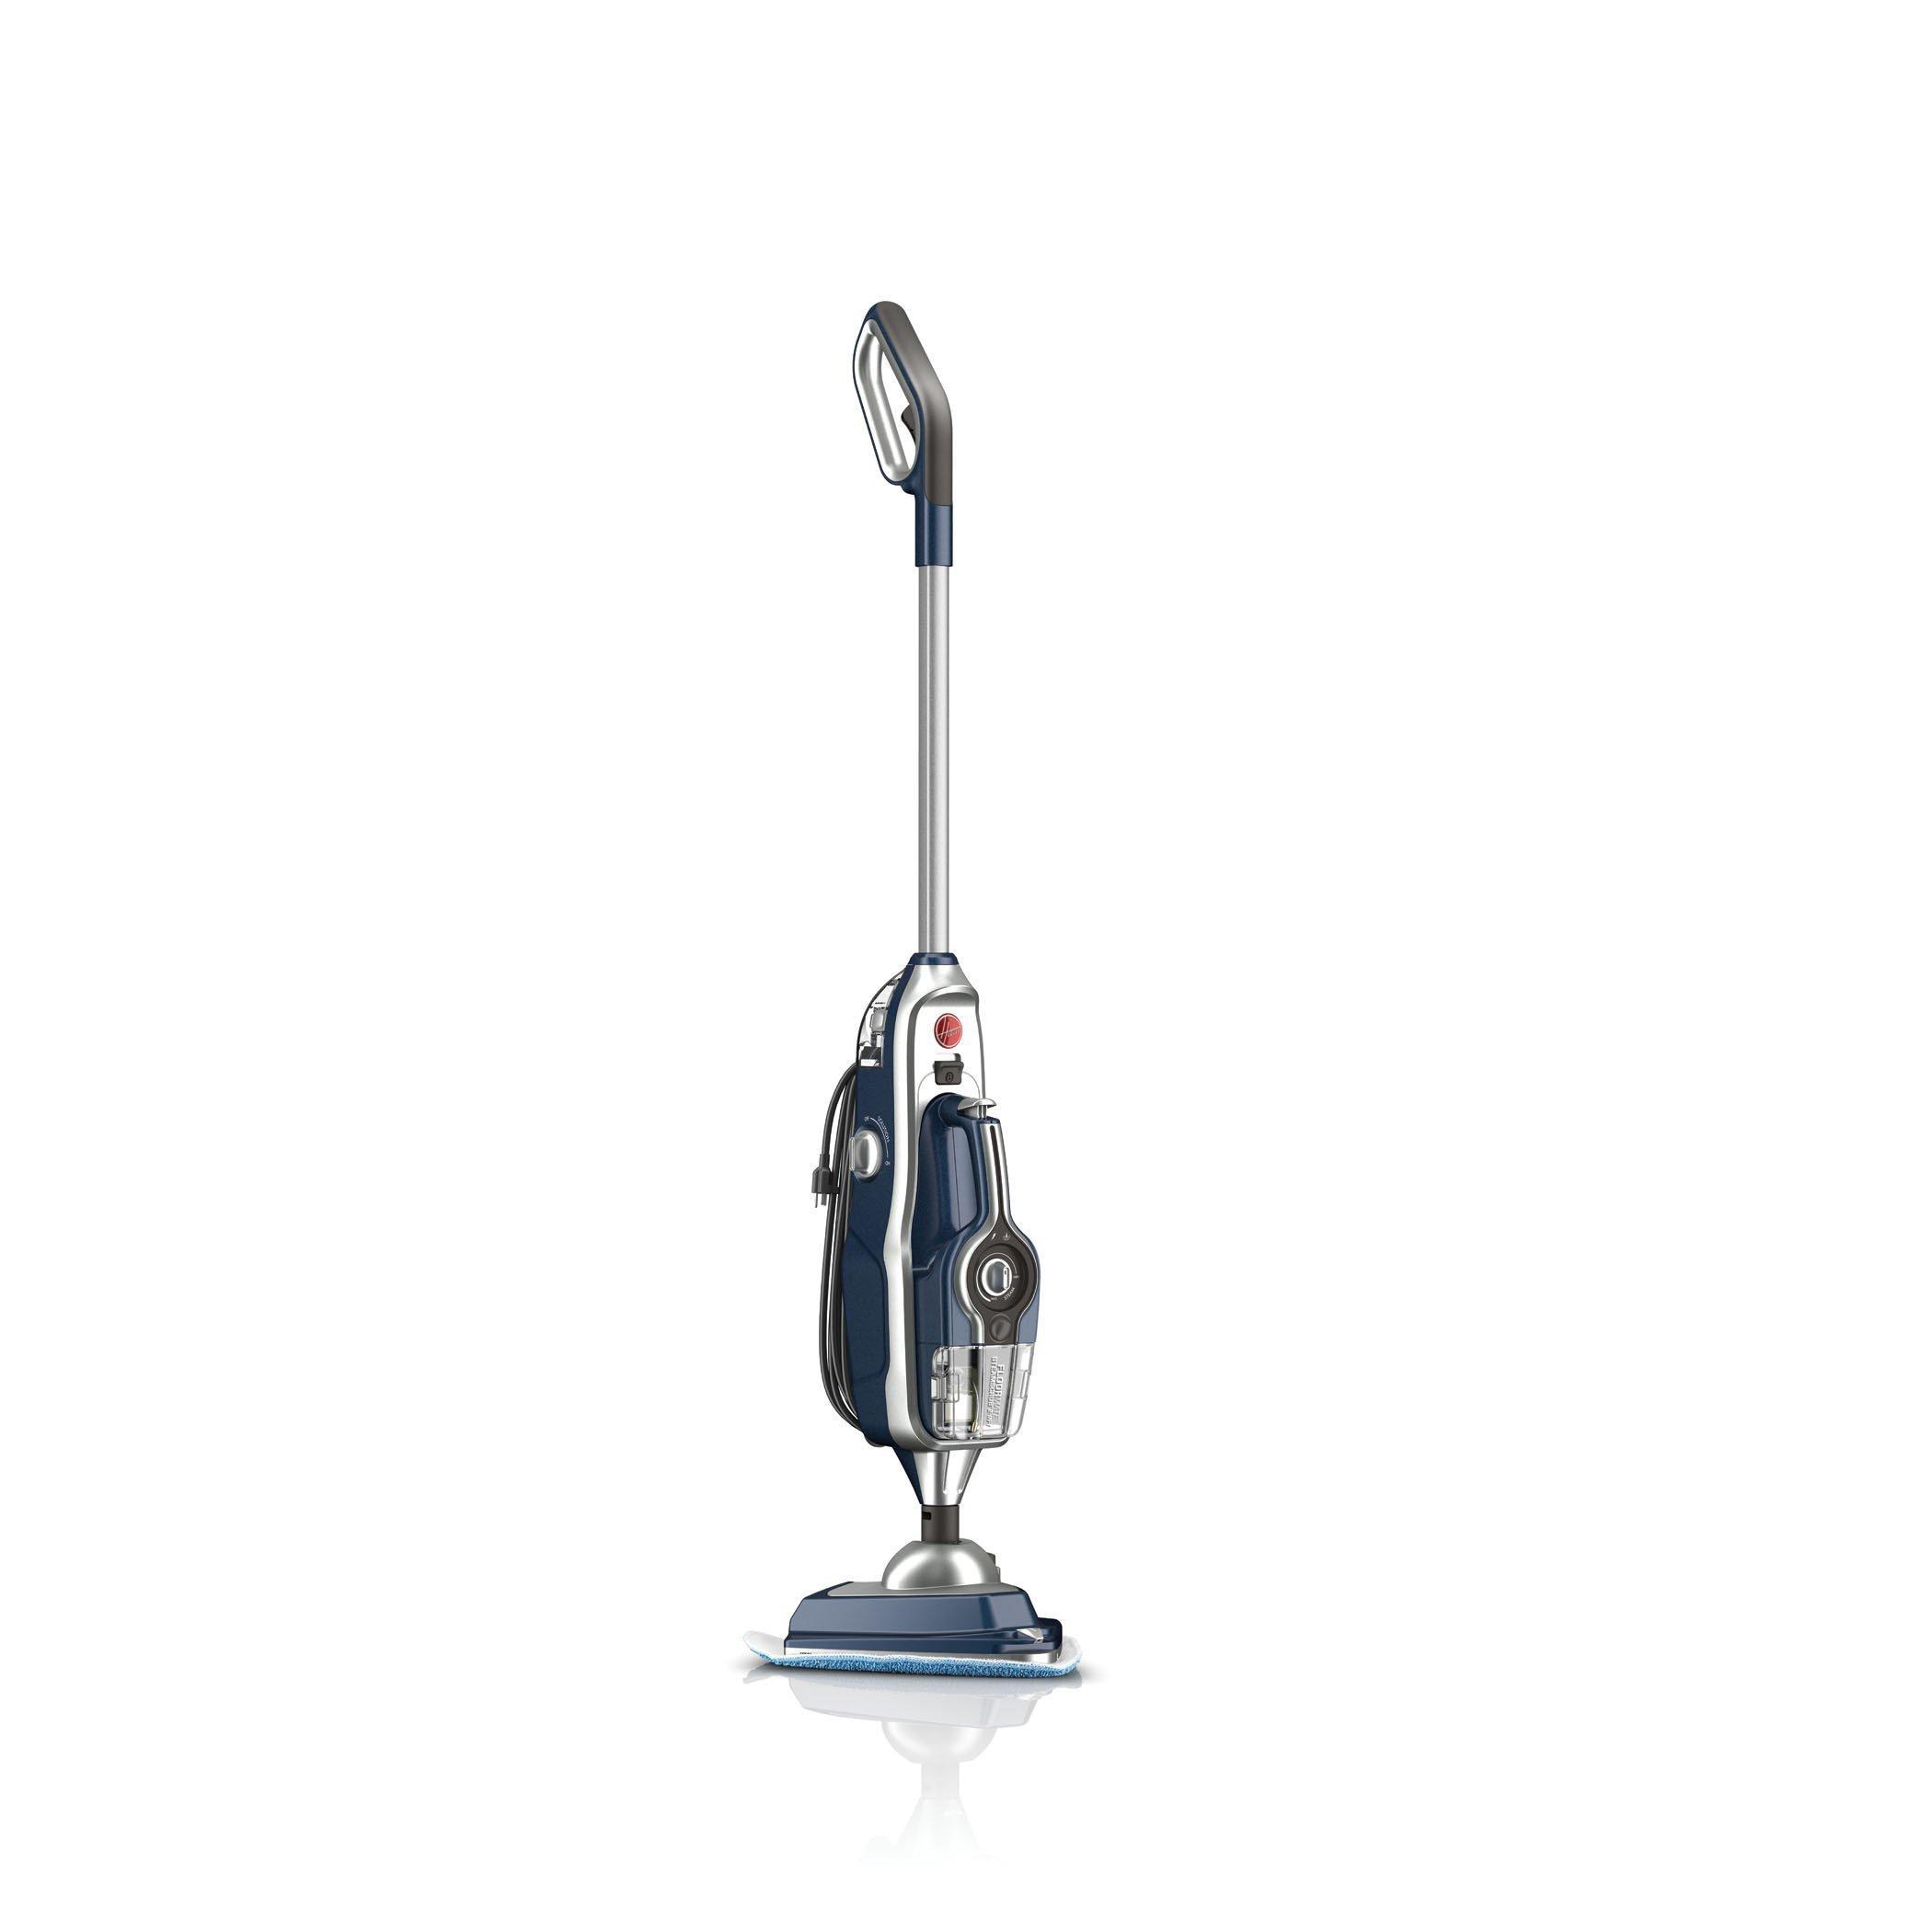 FloorMate SteamScrub Plus 2-in-1 Steam Mop2